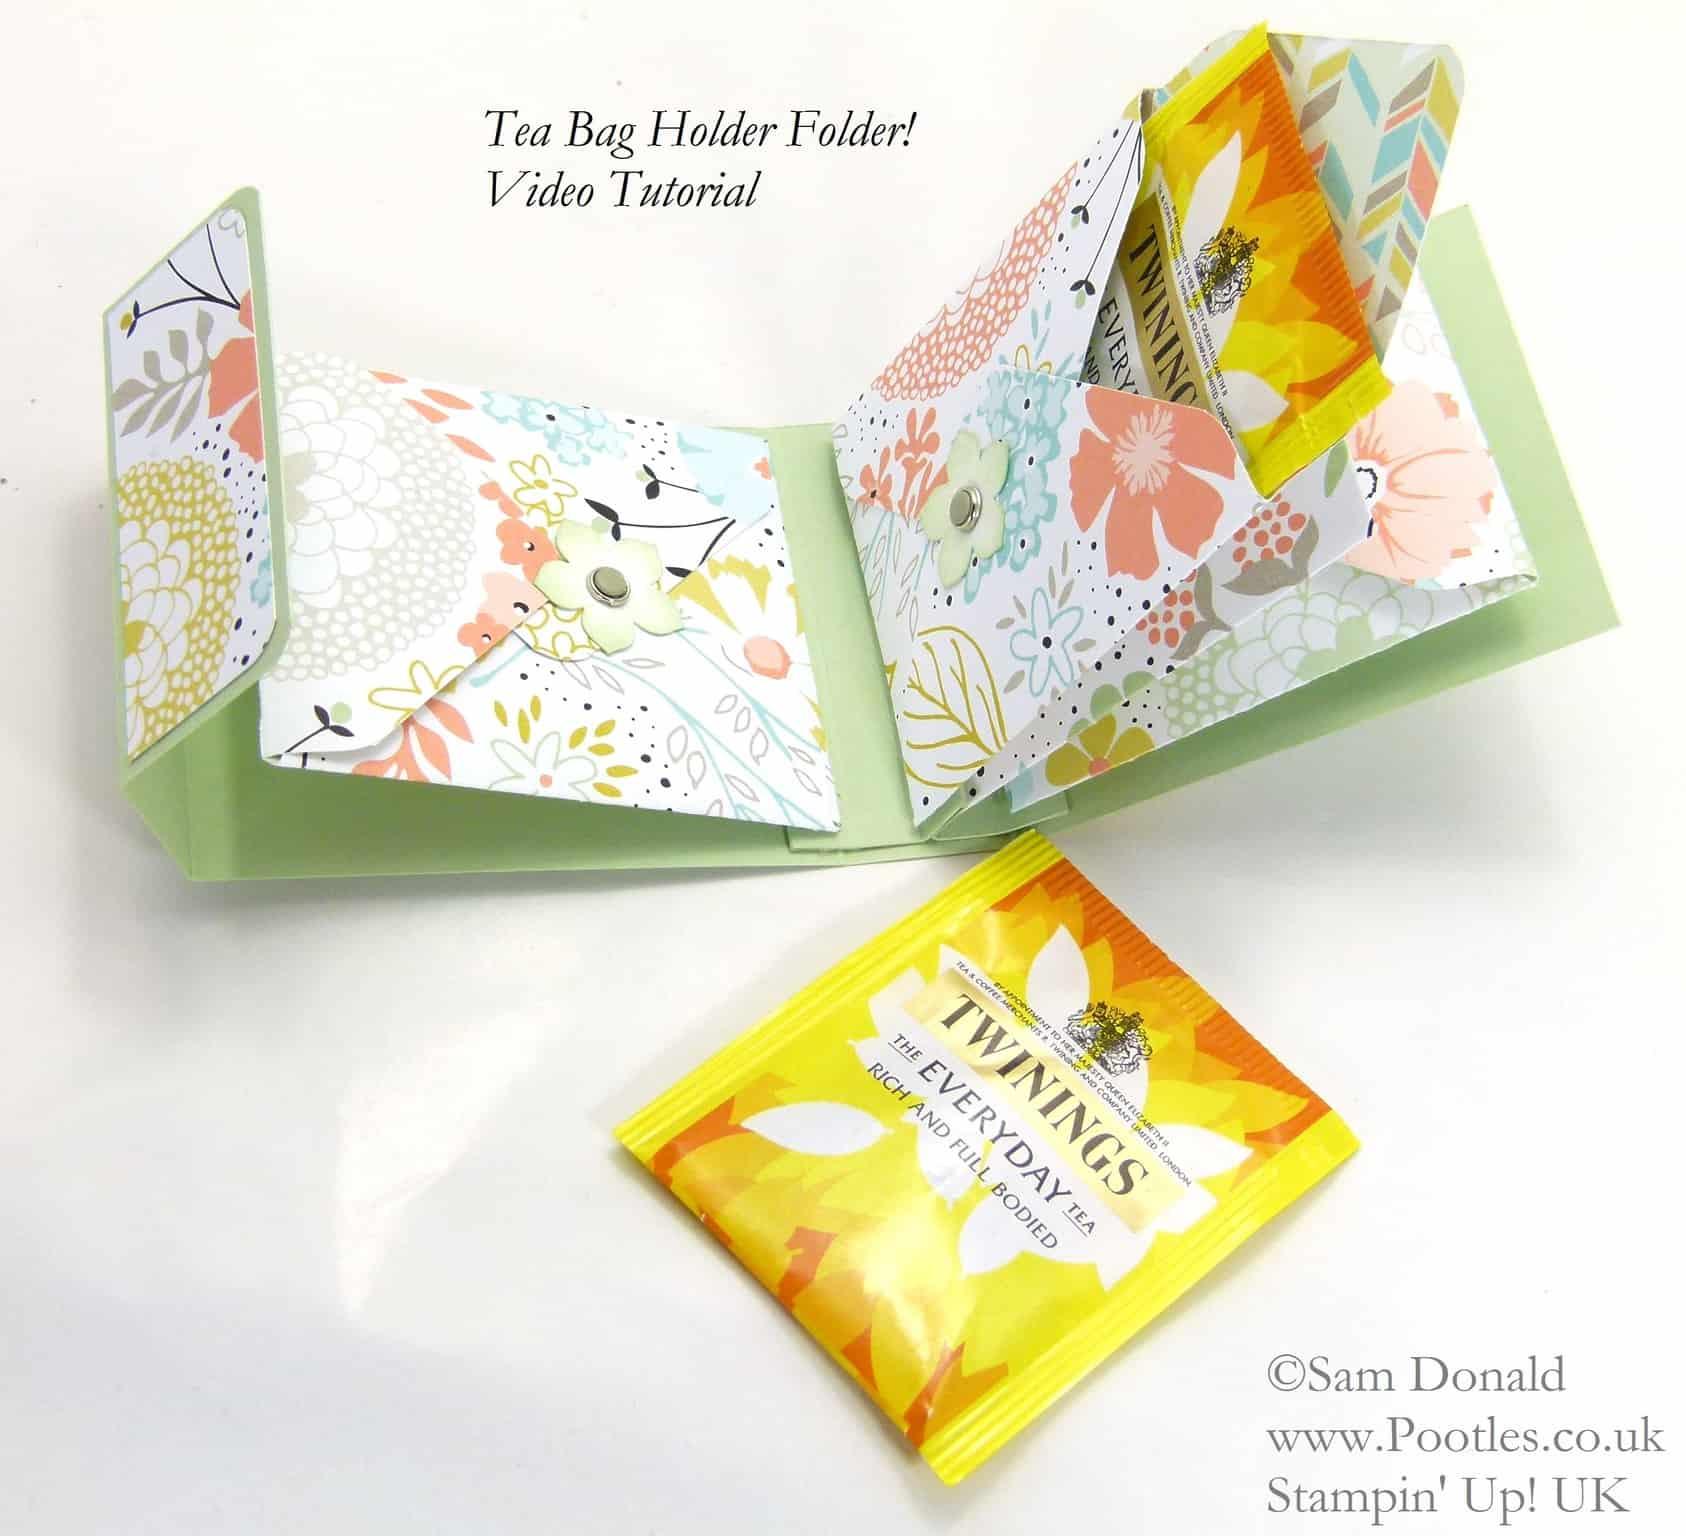 POOTLES Stampin' Up! UK Tea Bag Holder Folder Tutorial opened flat